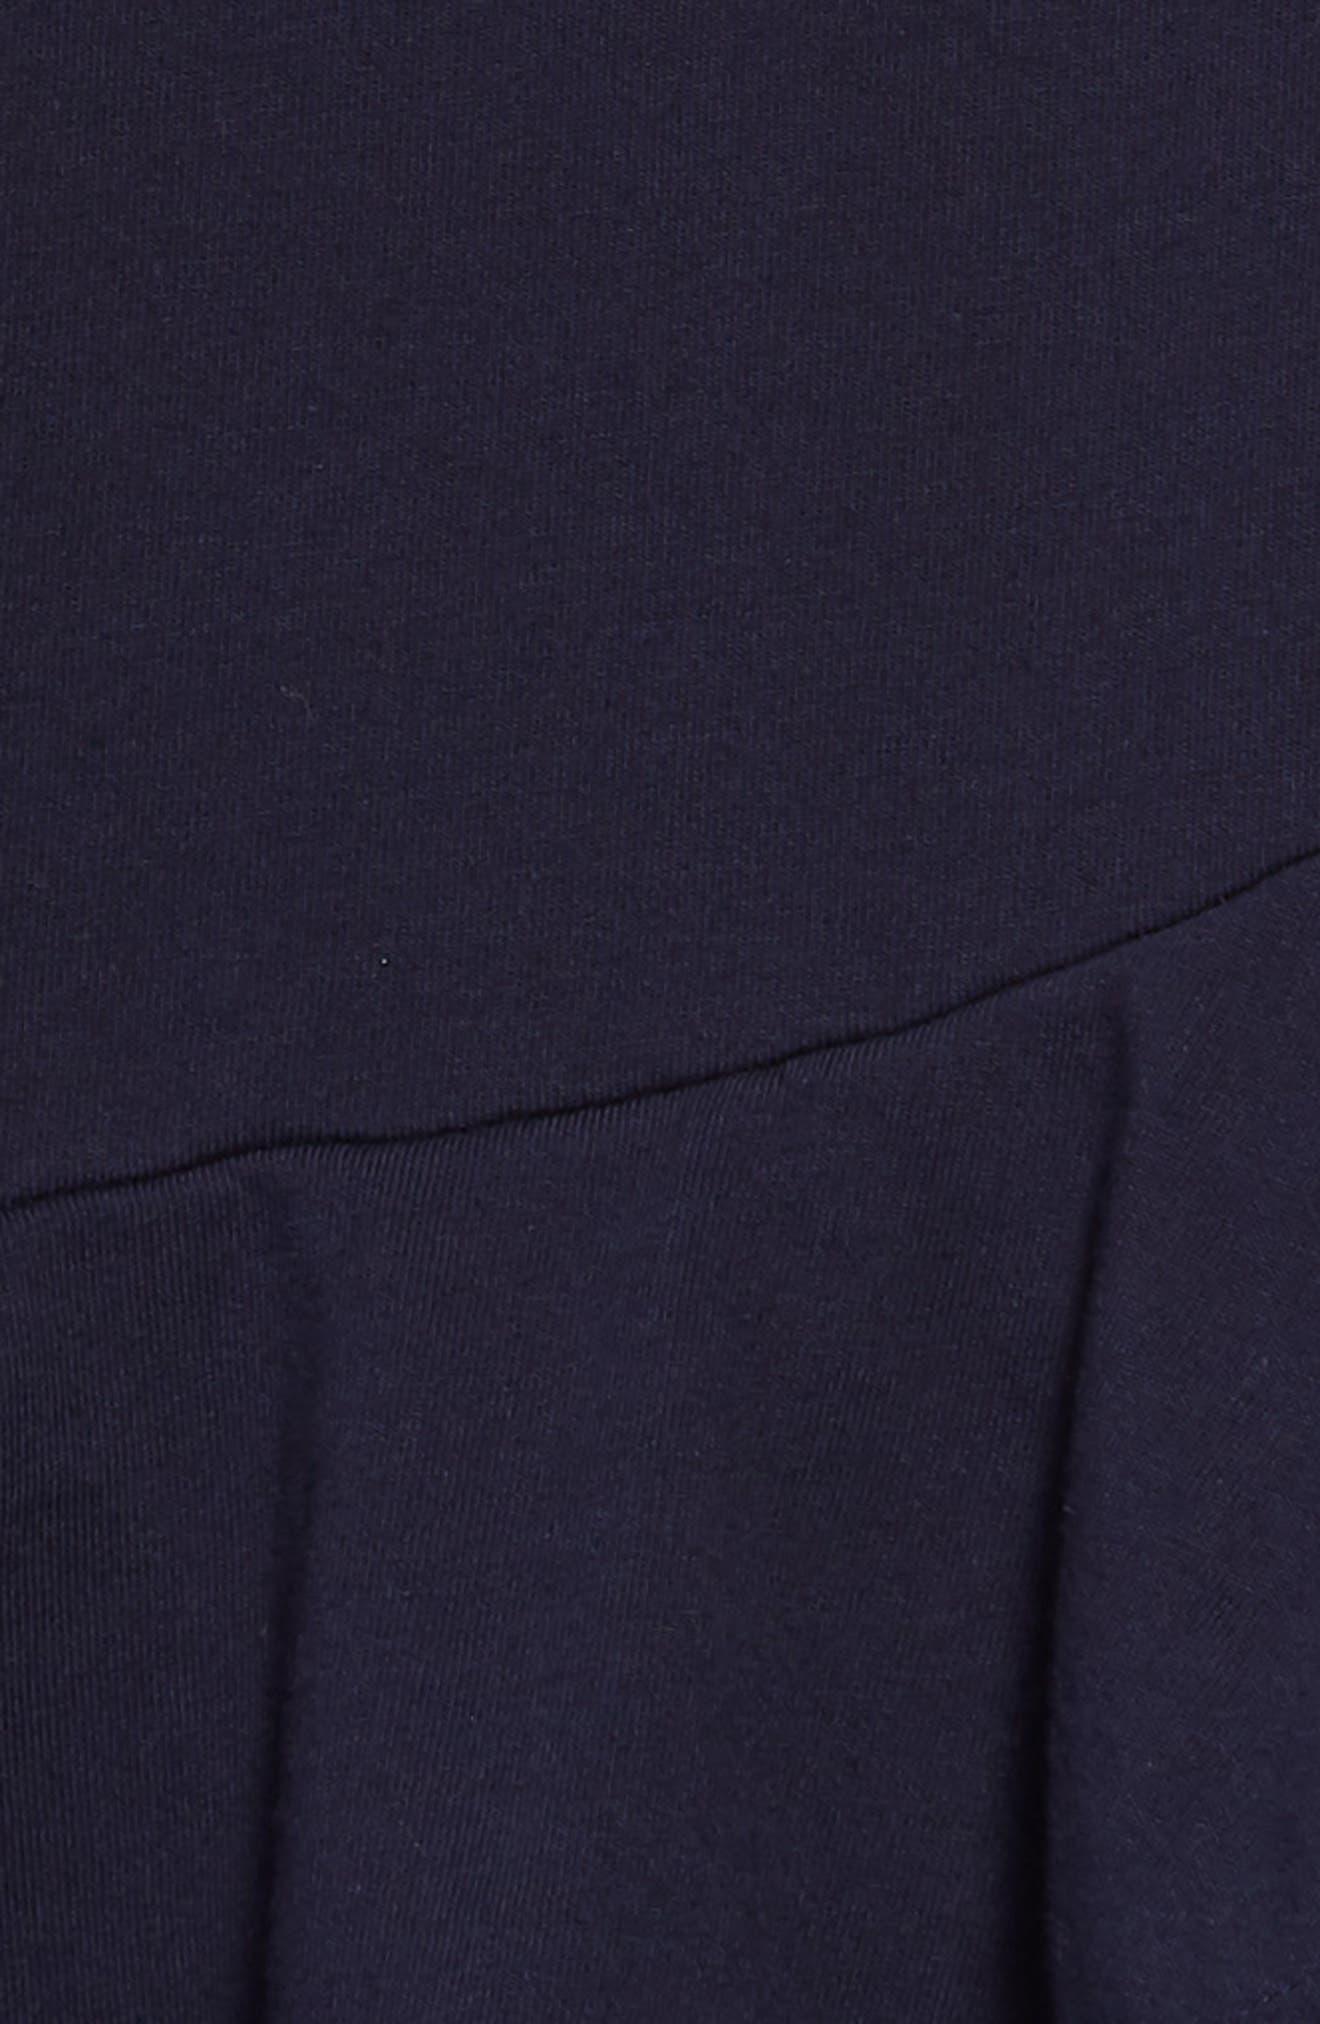 Ruffle Hem Dress,                             Alternate thumbnail 3, color,                             410